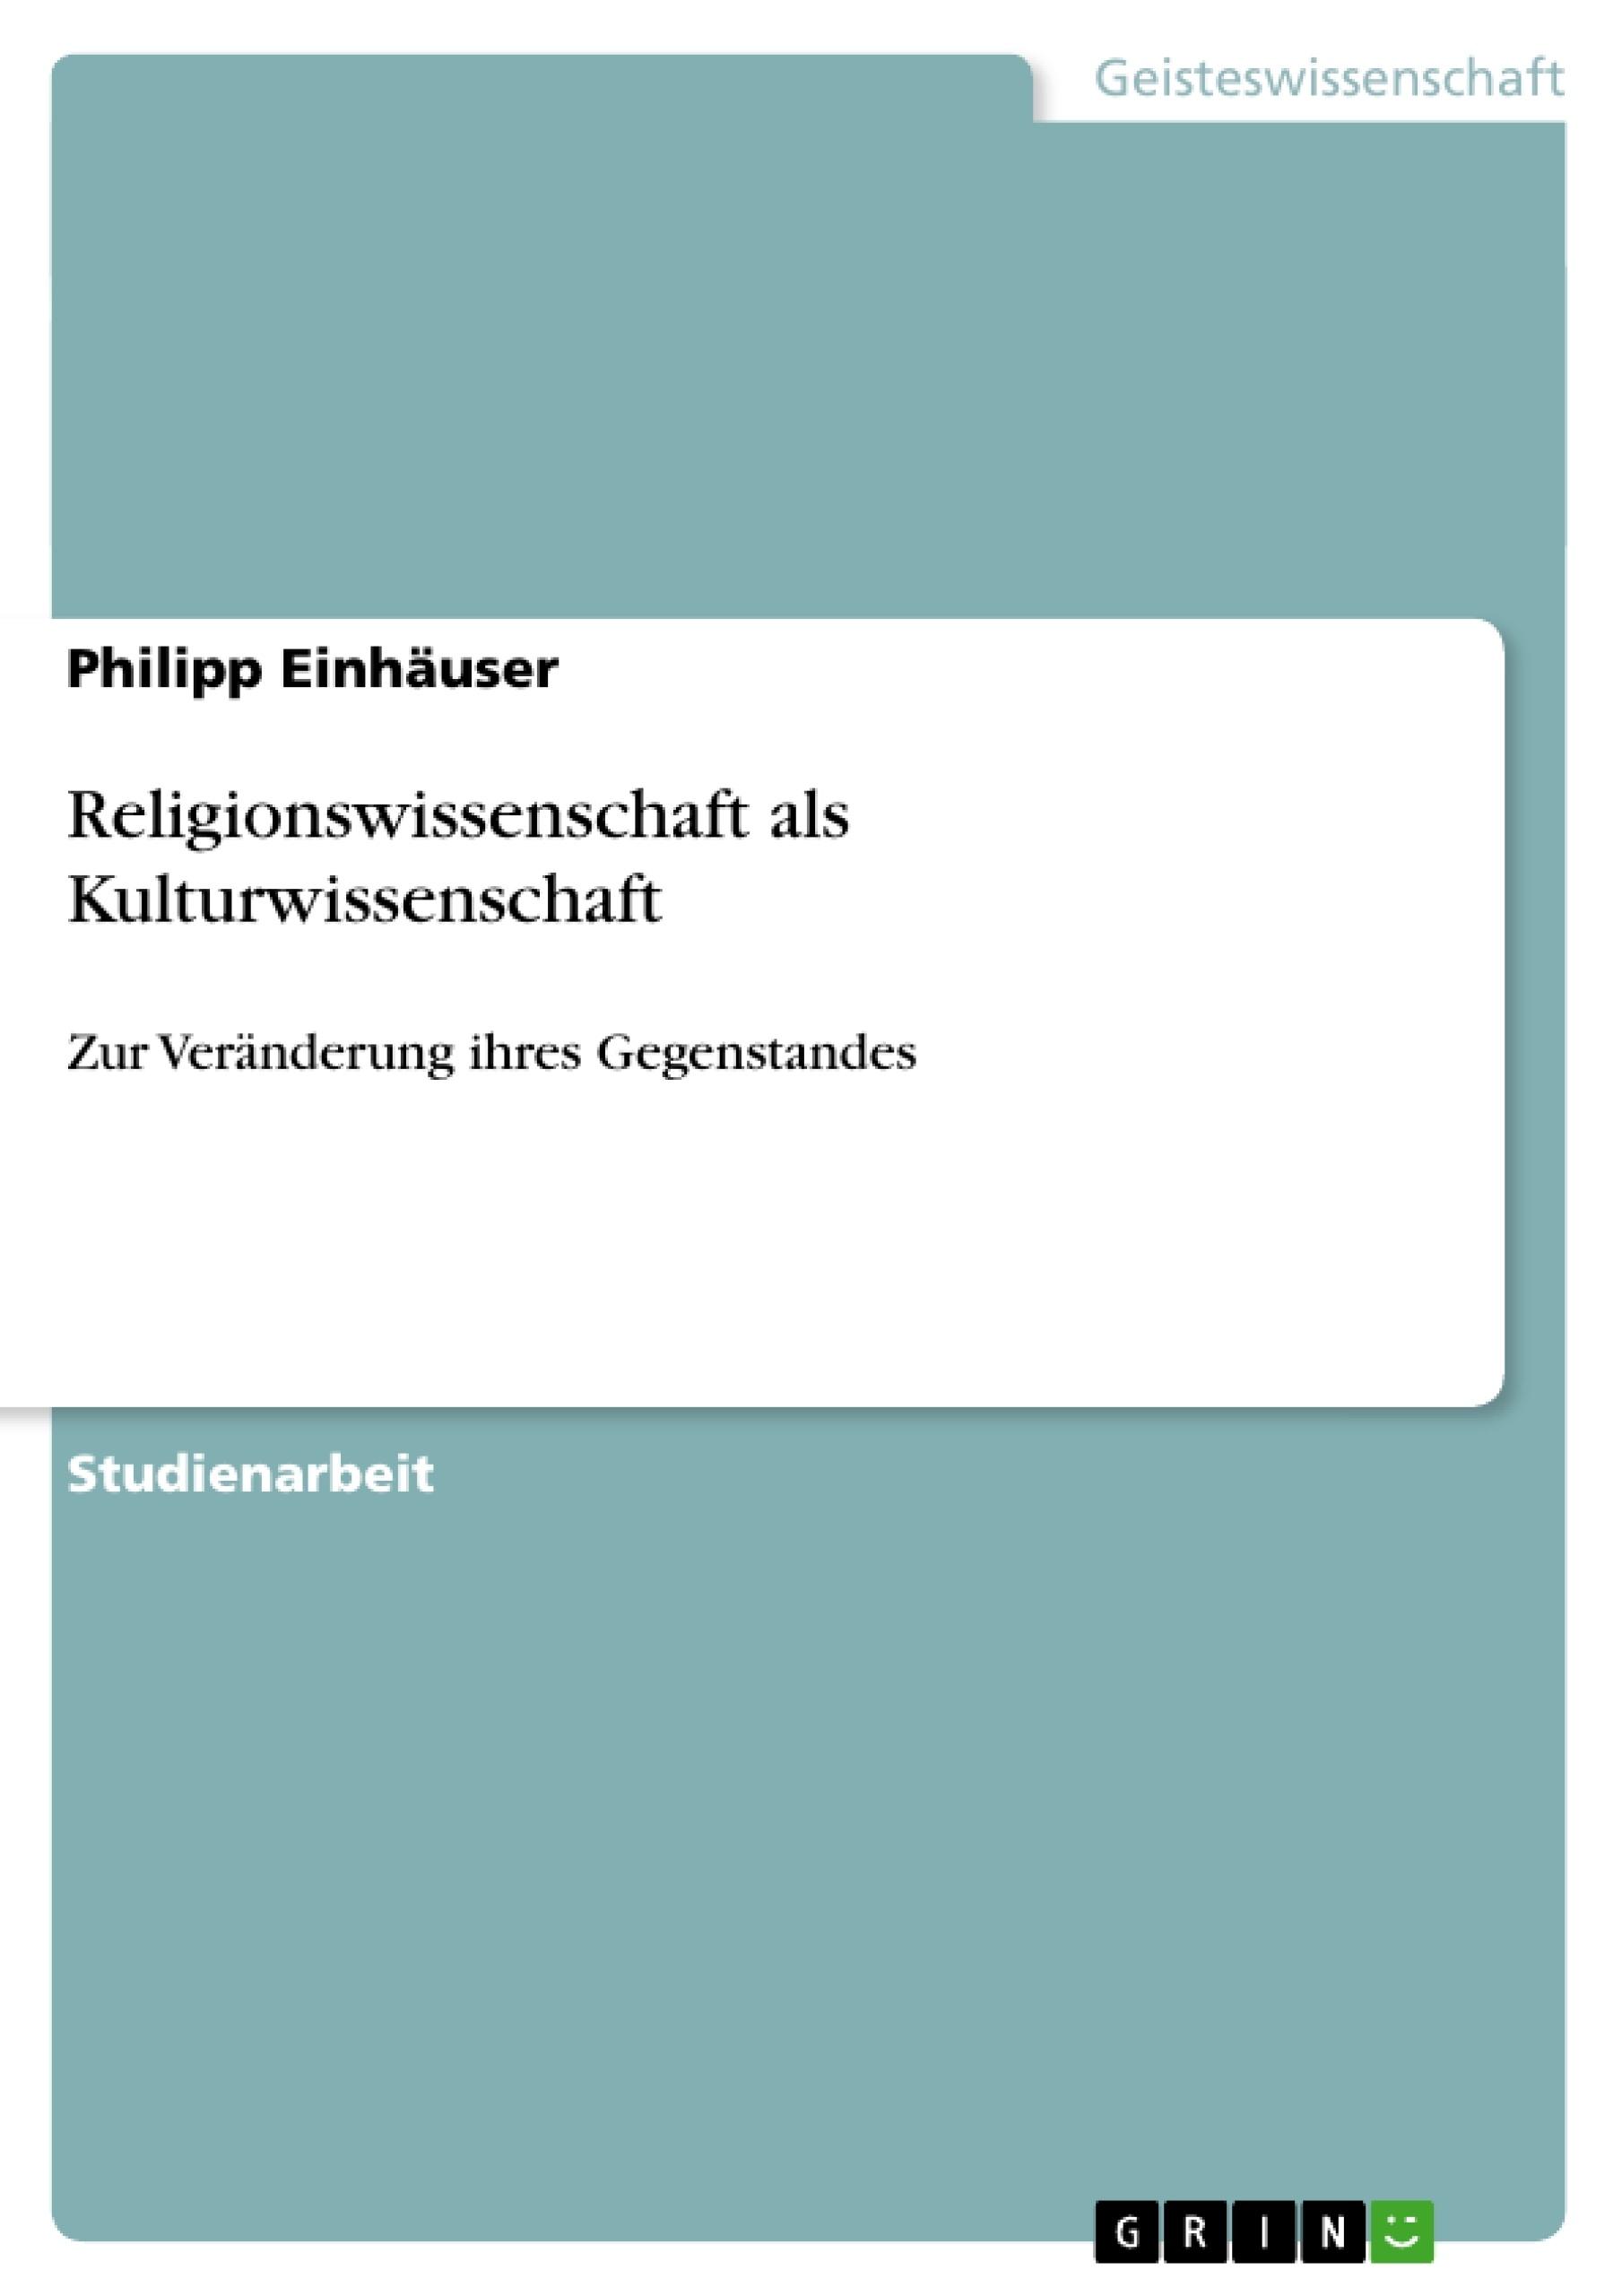 Titel: Religionswissenschaft als Kulturwissenschaft